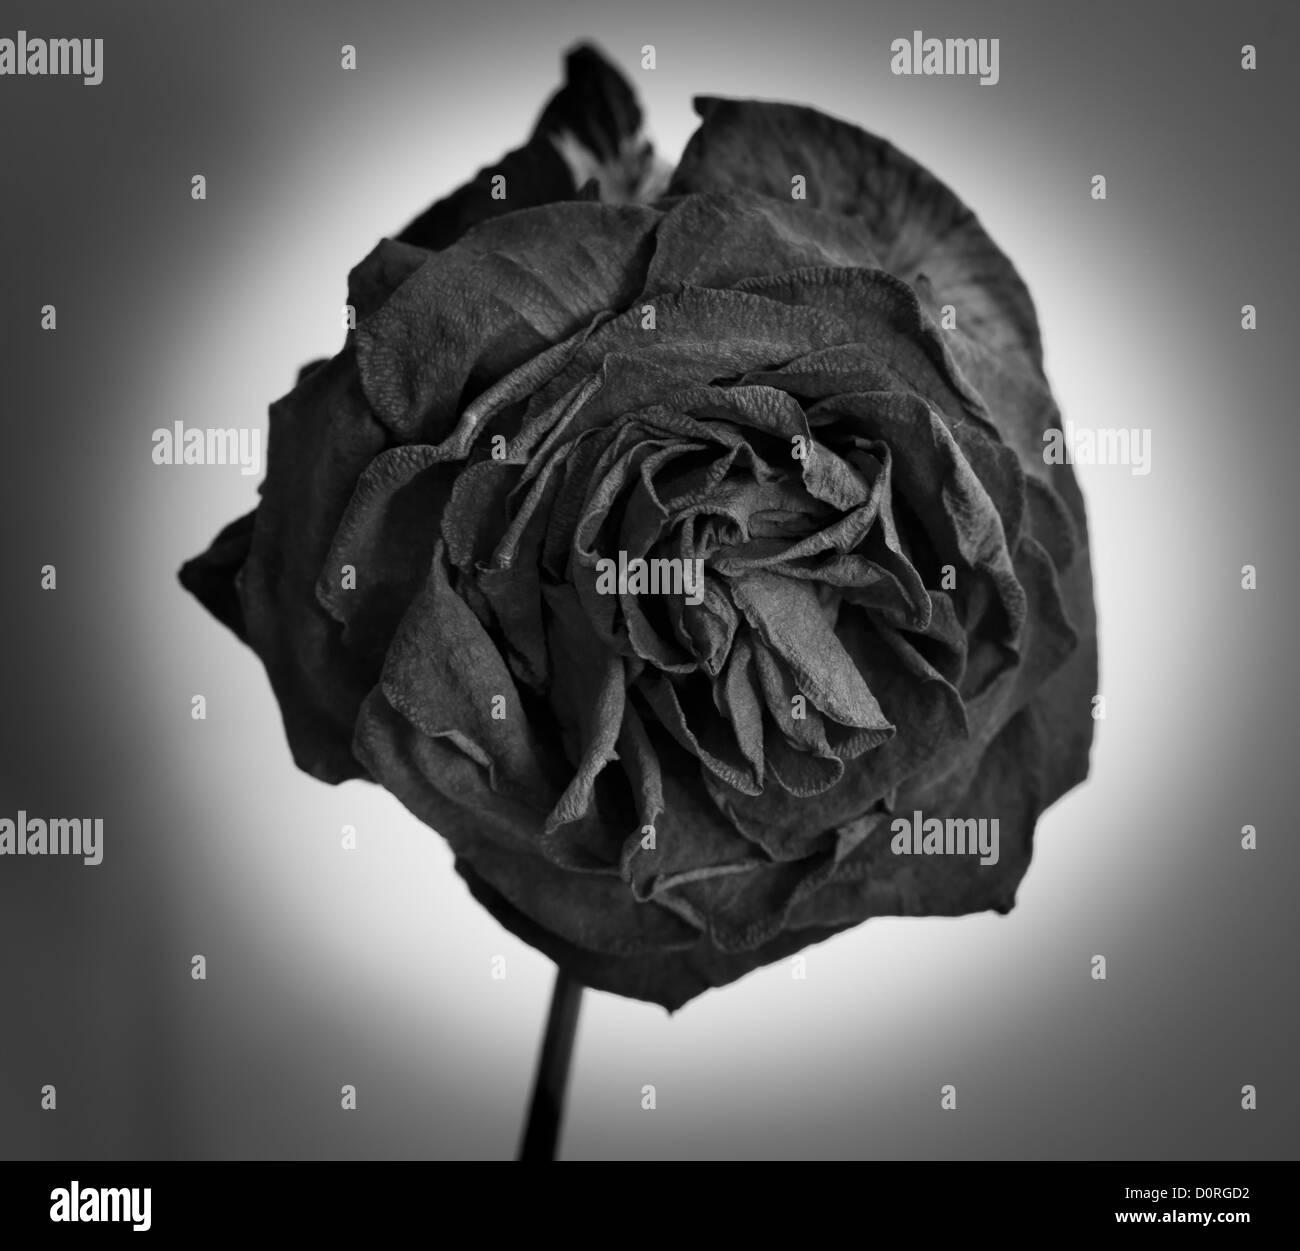 eine tot getrocknete schwarze rose in schwarz wei stockfoto bild 52148910 alamy. Black Bedroom Furniture Sets. Home Design Ideas